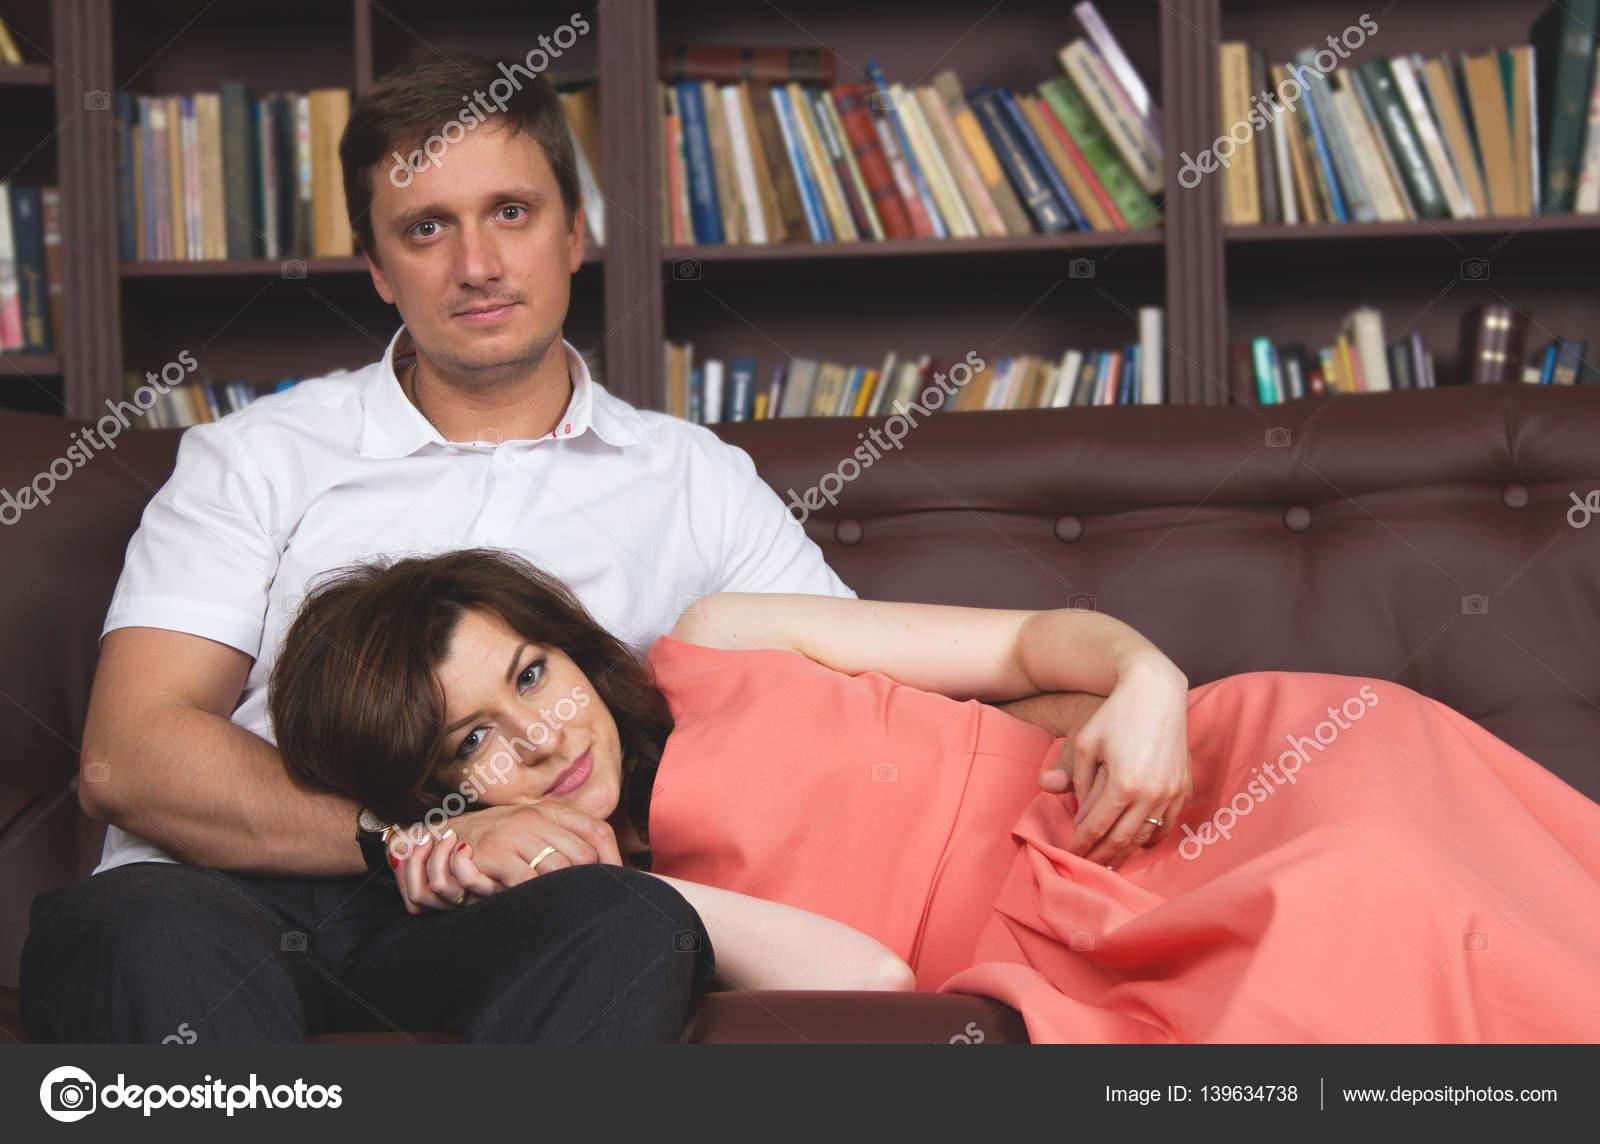 Фото голых молодая русская пара на диване порно